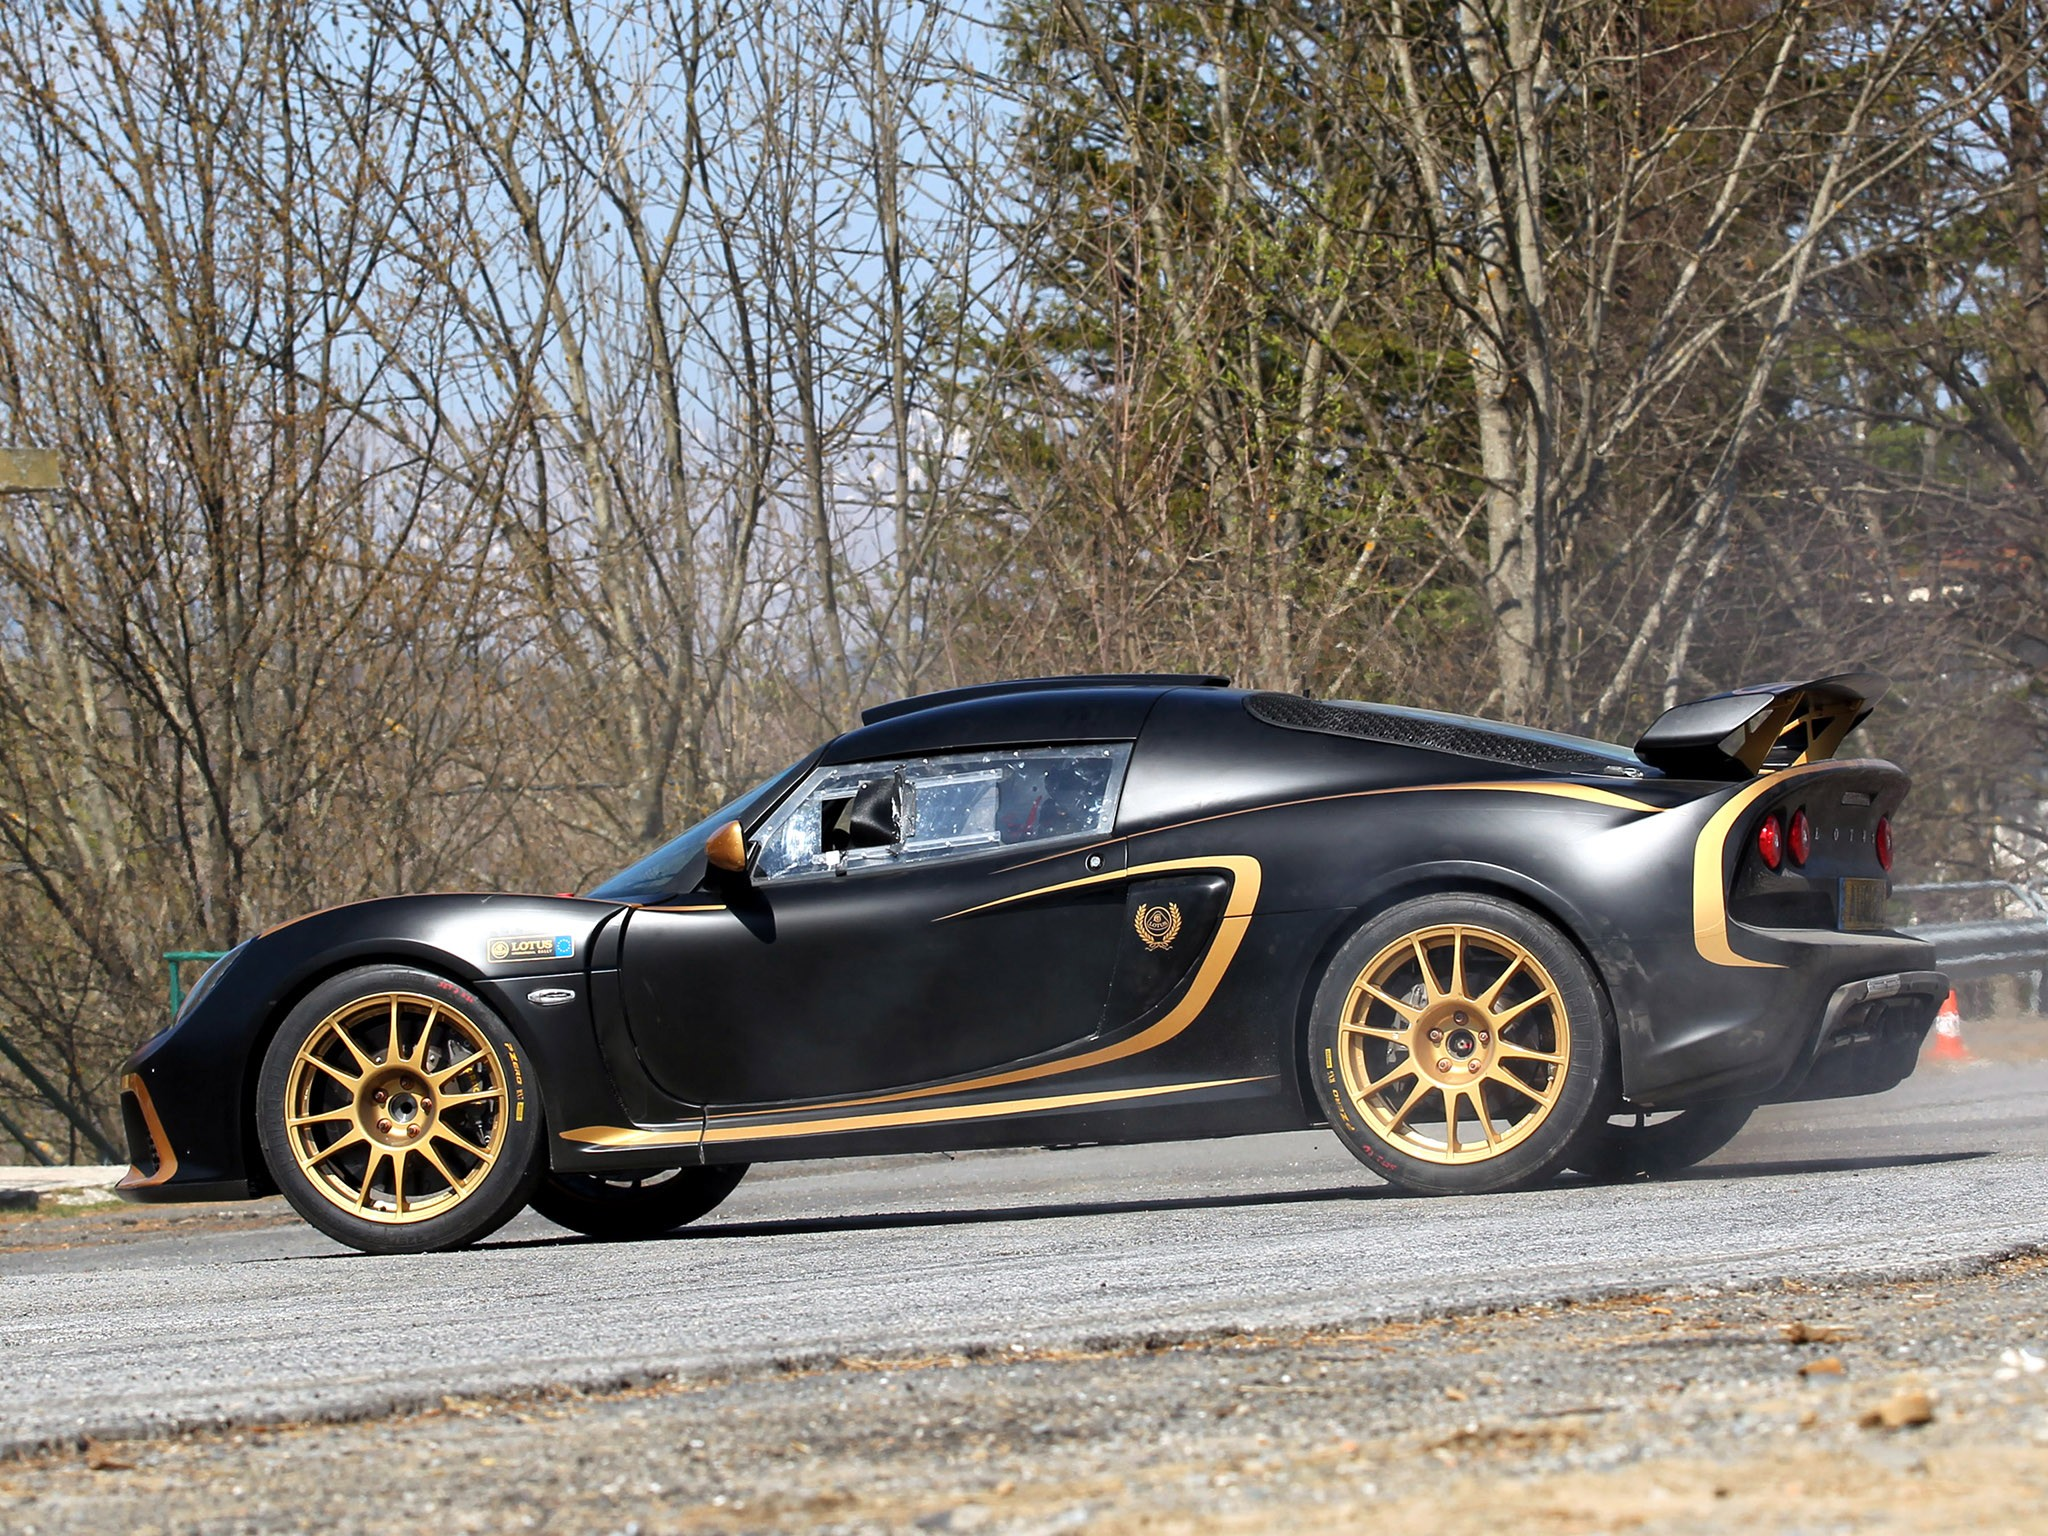 2012 Lotus Exige R GT Black Gold